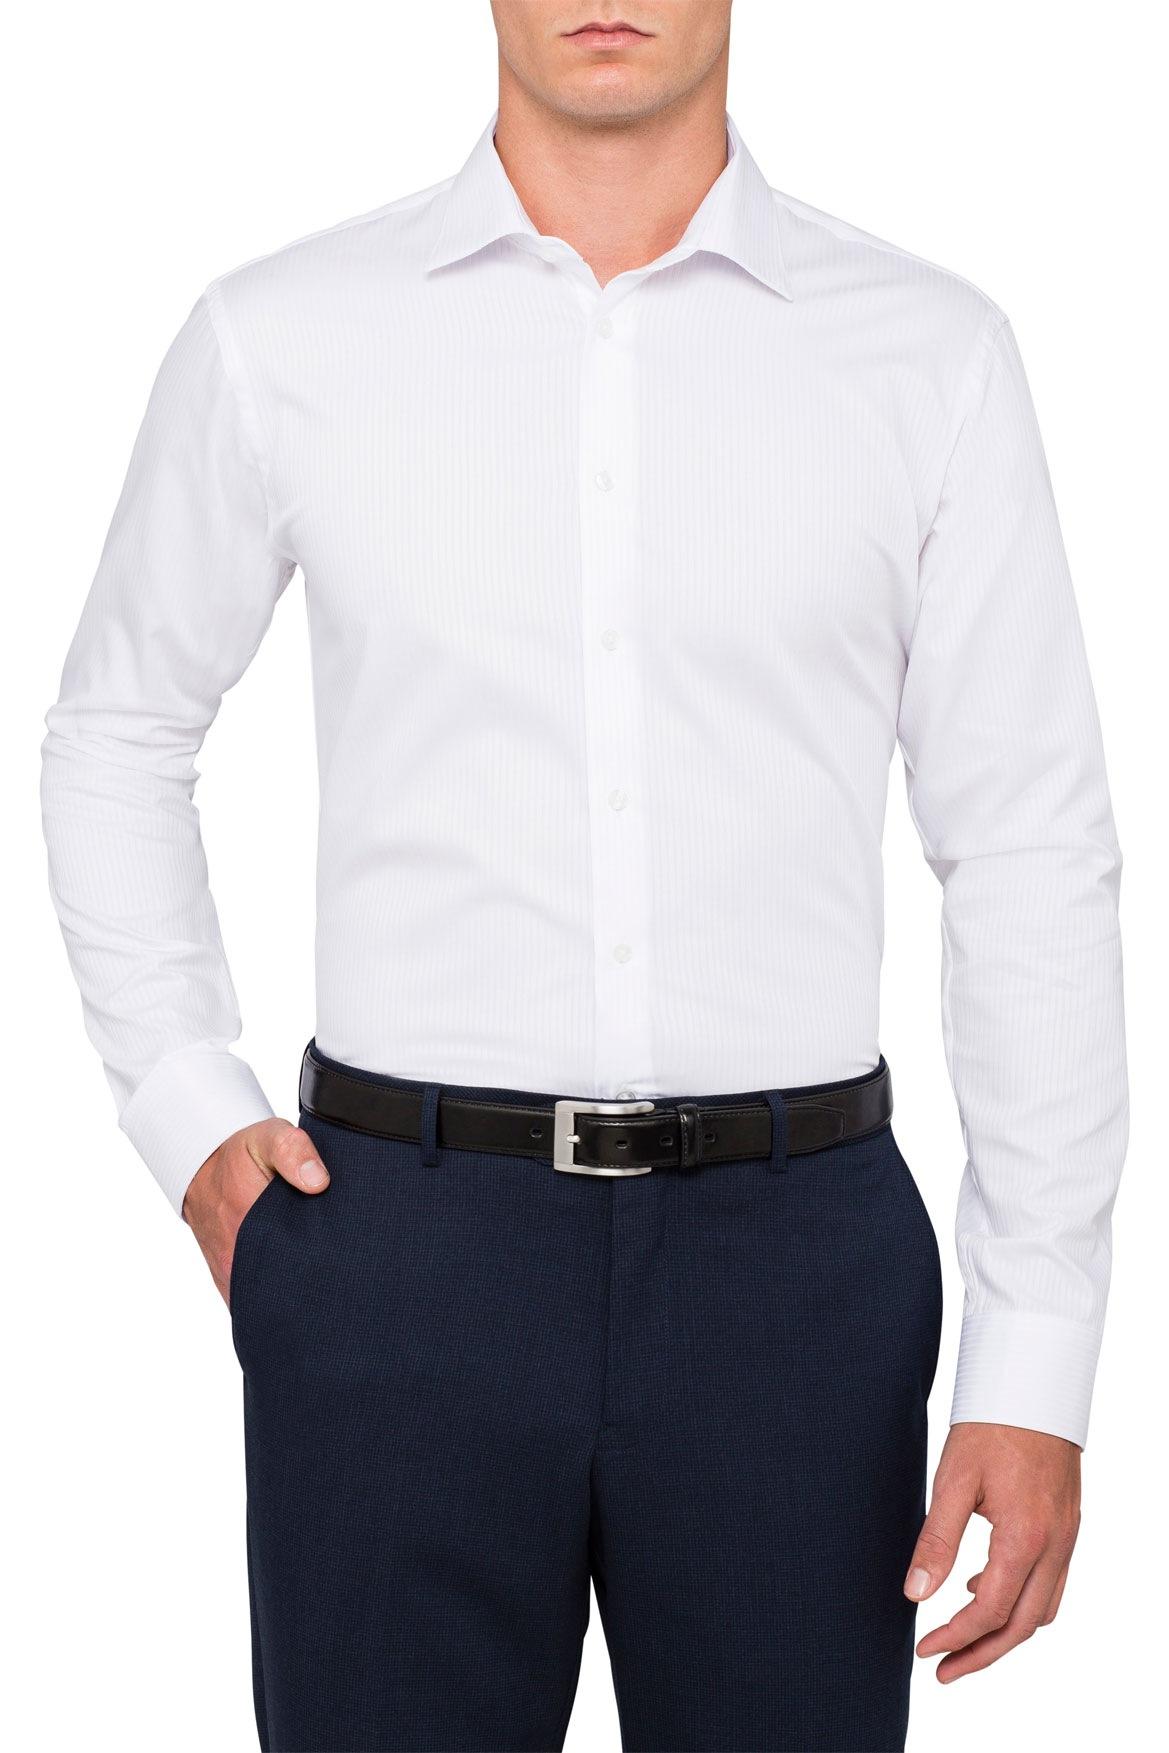 Calvin Klein Steel | White Self Stripe Business Shirt | Myer Online